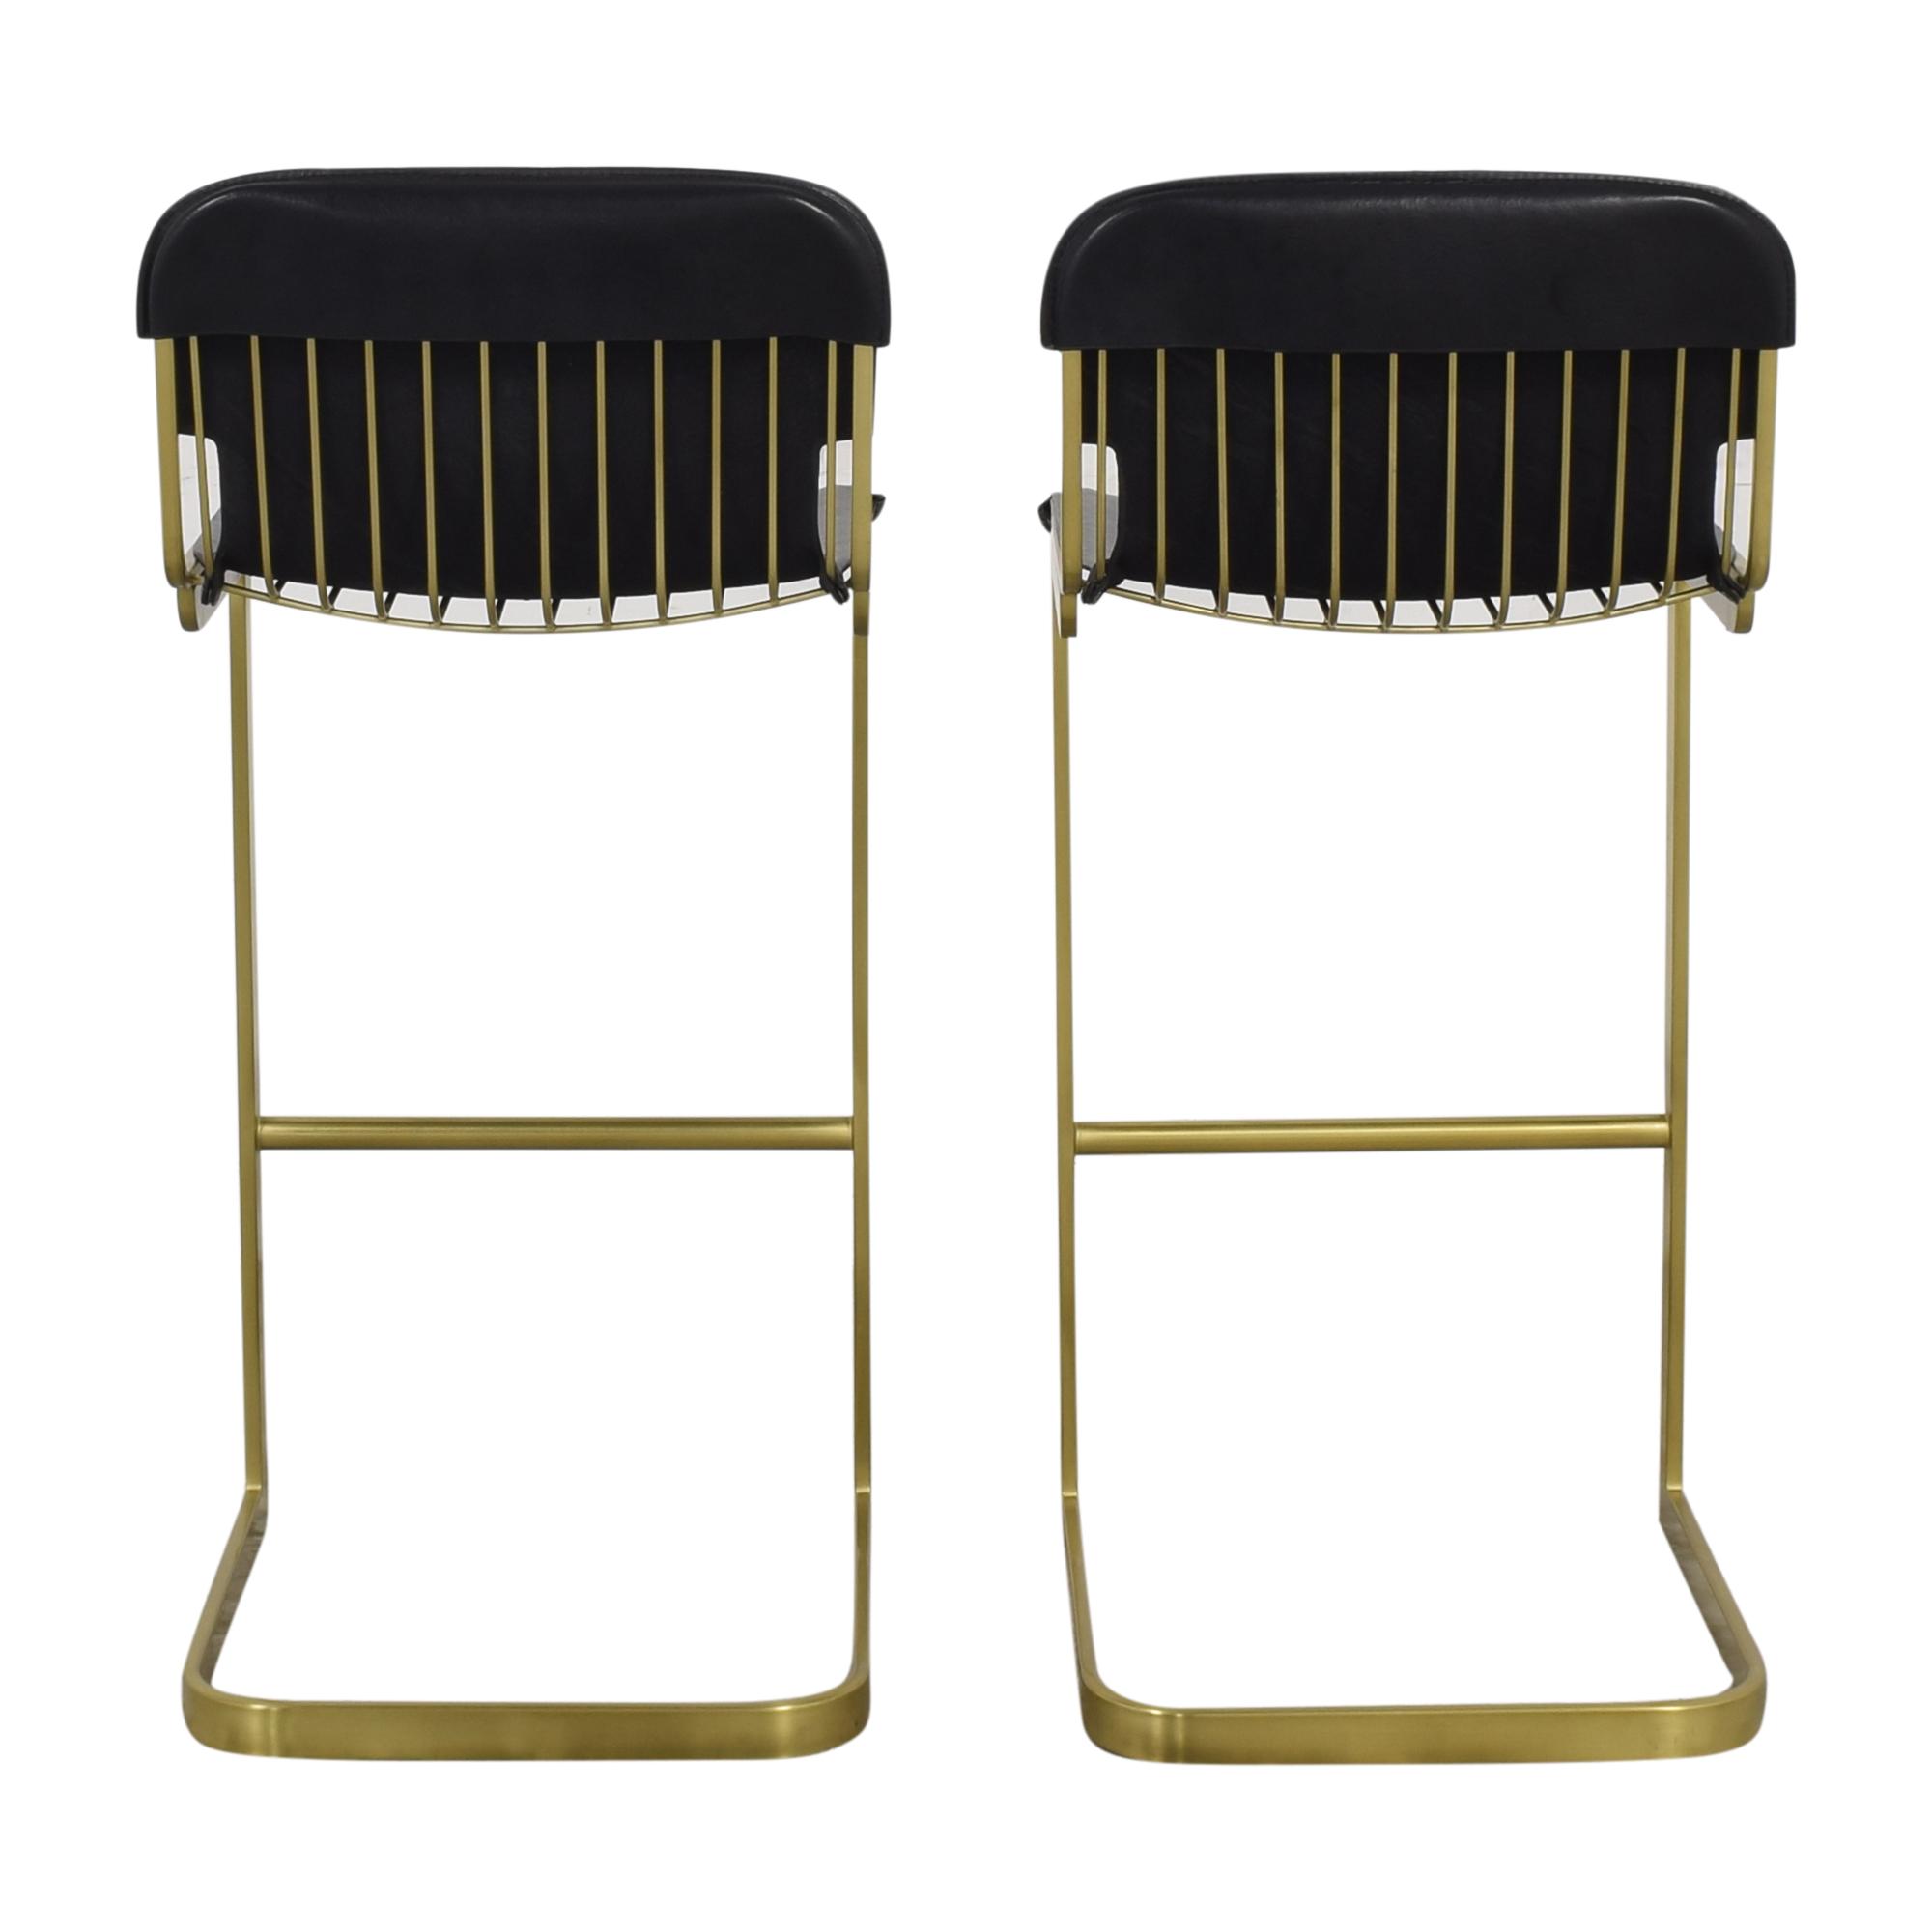 buy CB2 Rake Brass Bar Stools CB2 Chairs